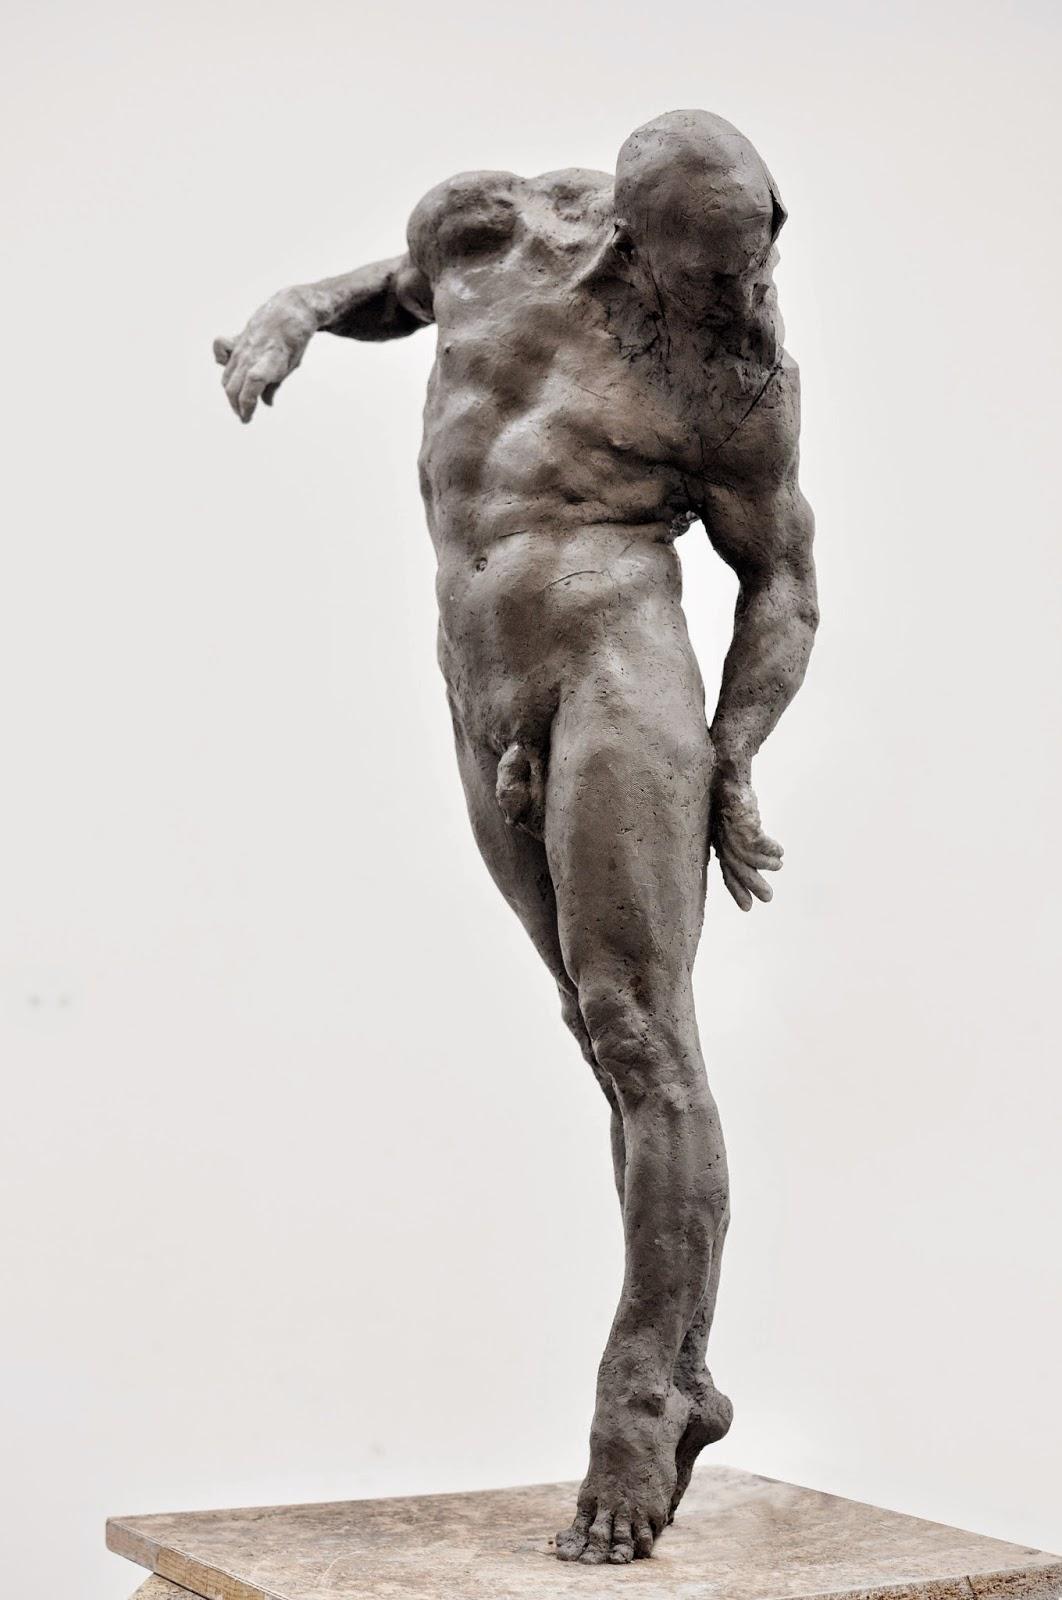 Grzegorz Gwiazda – flightless sculpture